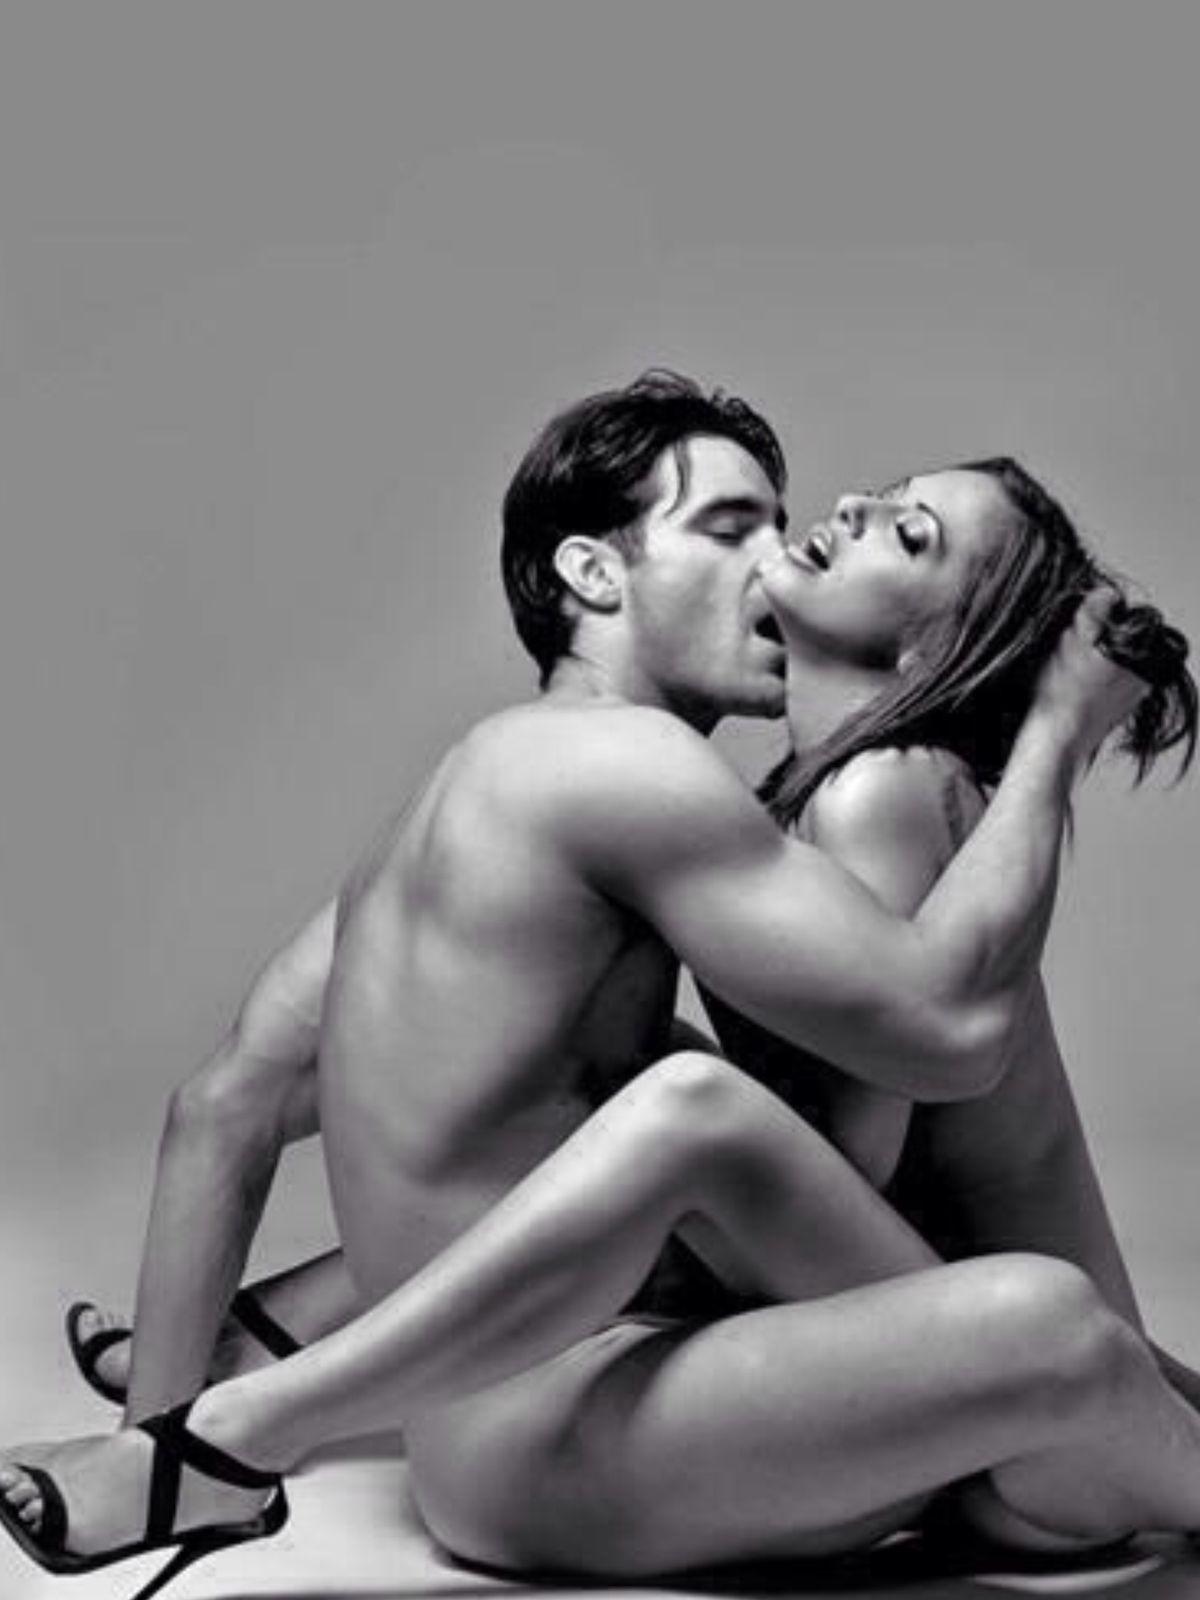 sex positions that enhance emotional intimacy tumblr granny sex